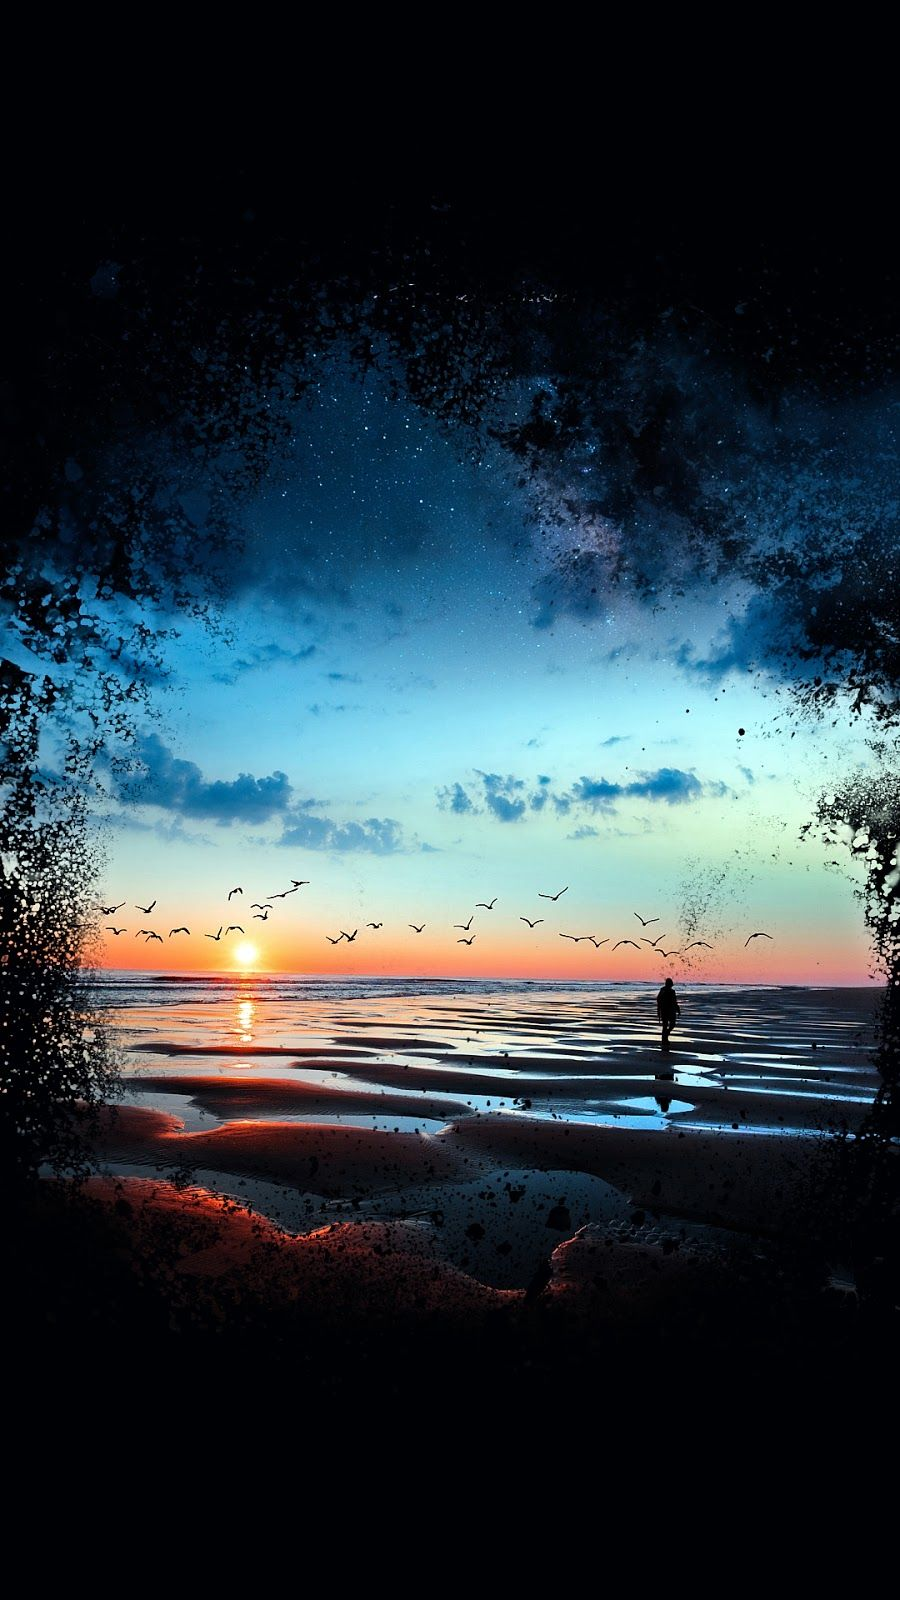 Peaceful Nature Wallpaper Landscape Background Landscape